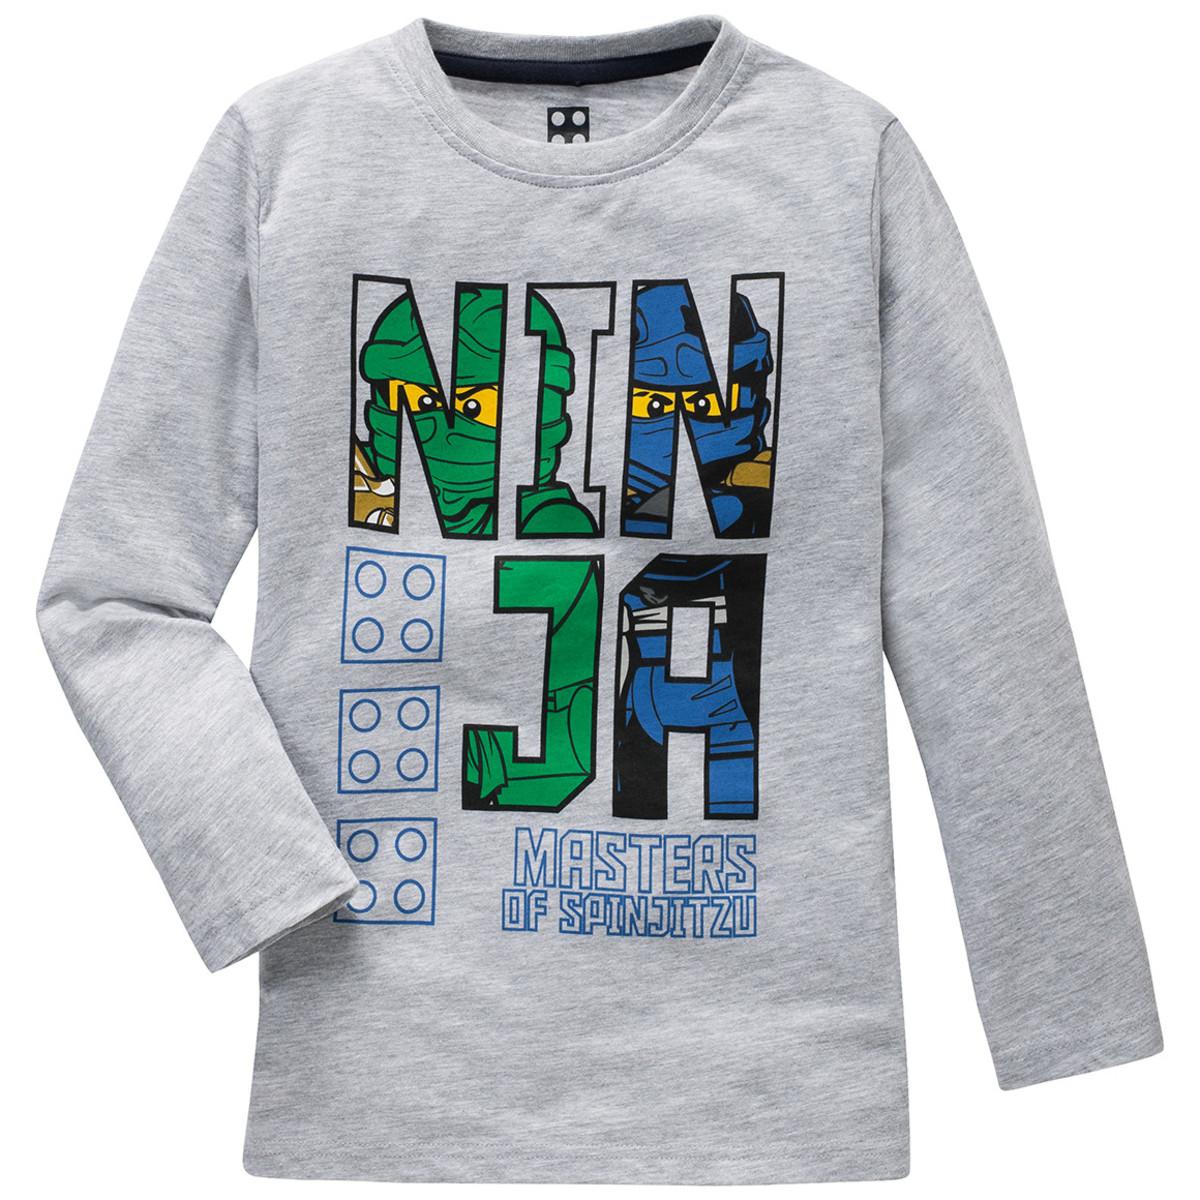 Bild 3 von LEGO Ninjago Schlafanzug